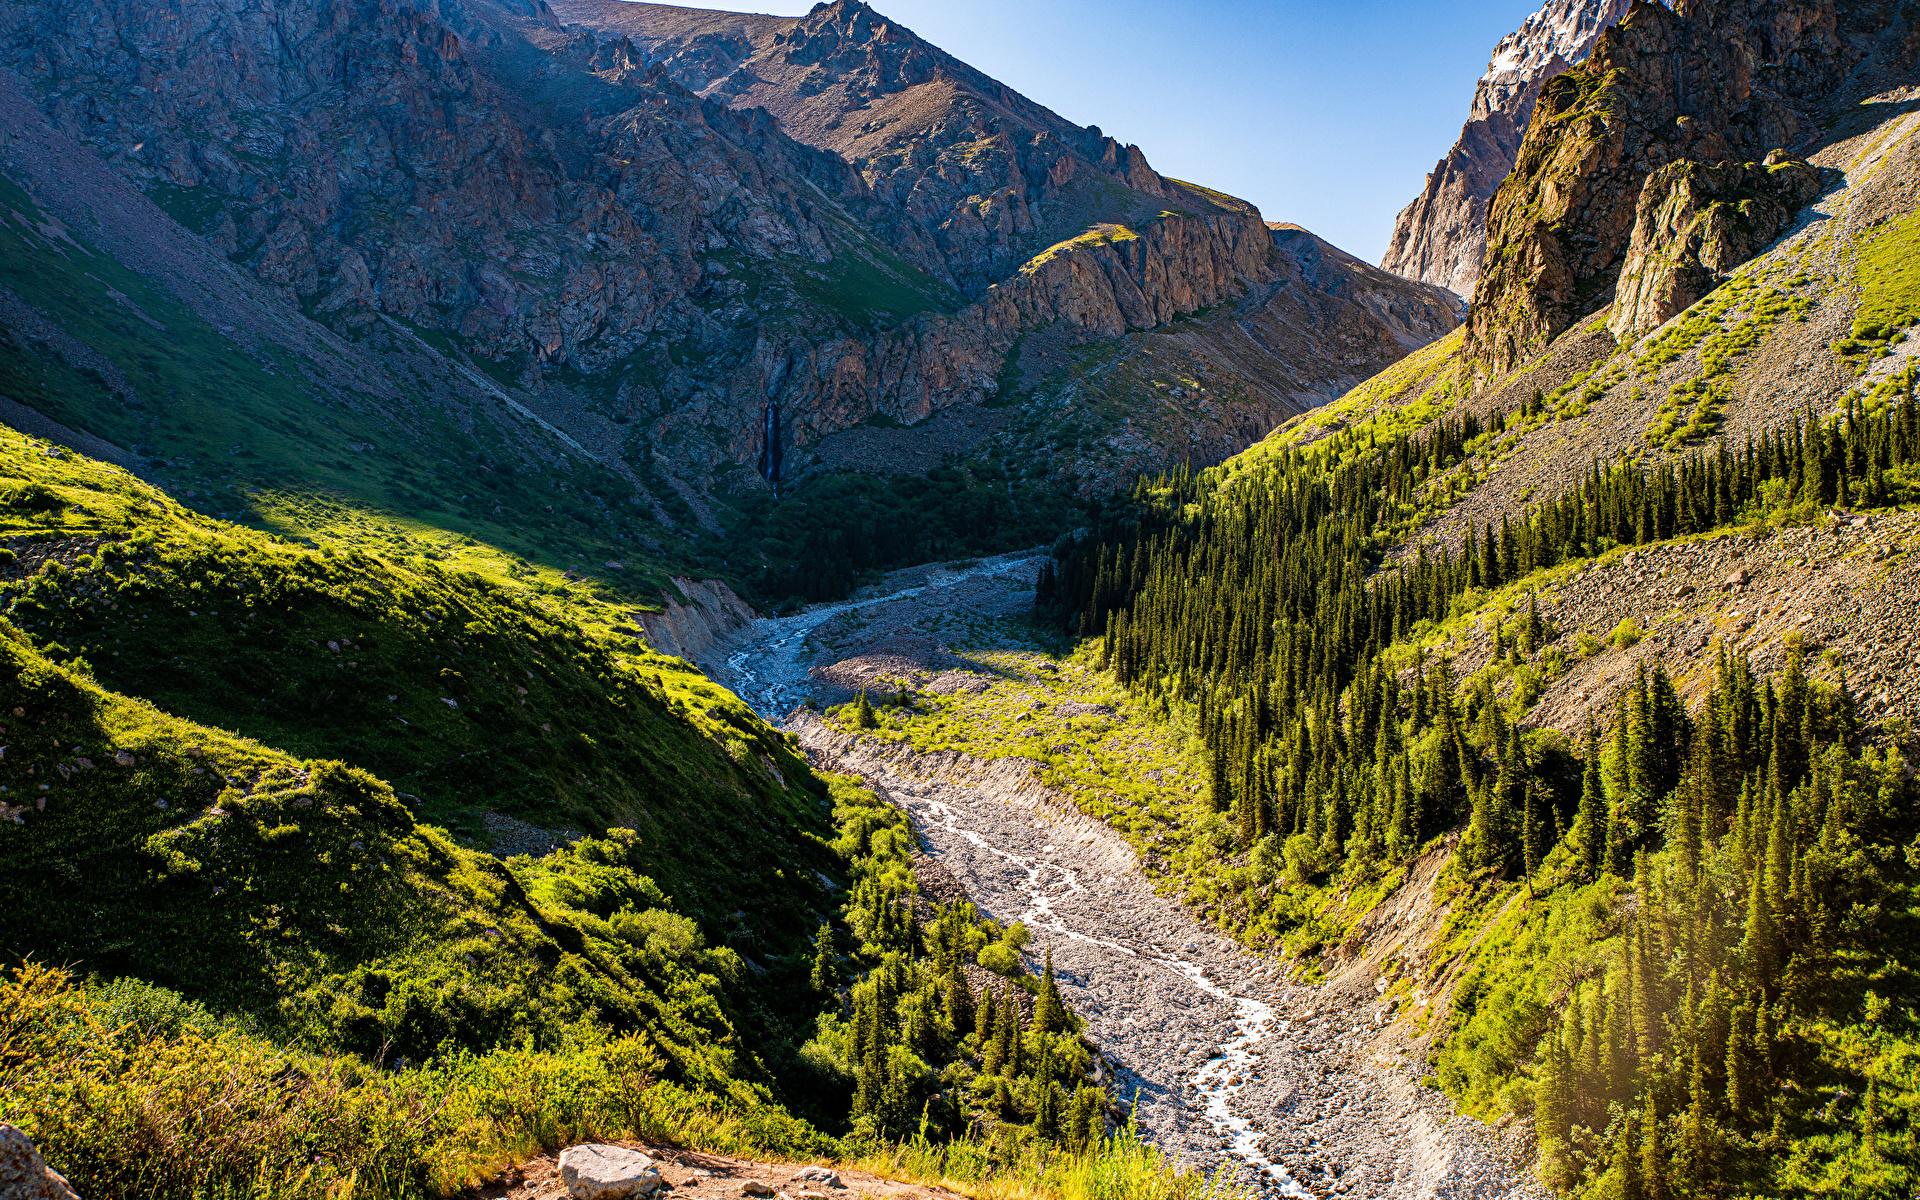 Desktop Hintergrundbilder Ala Archa National Park, Kyrgyzstan Berg Bach Natur Felsen Parks 1920x1200 Bäche Gebirge Park